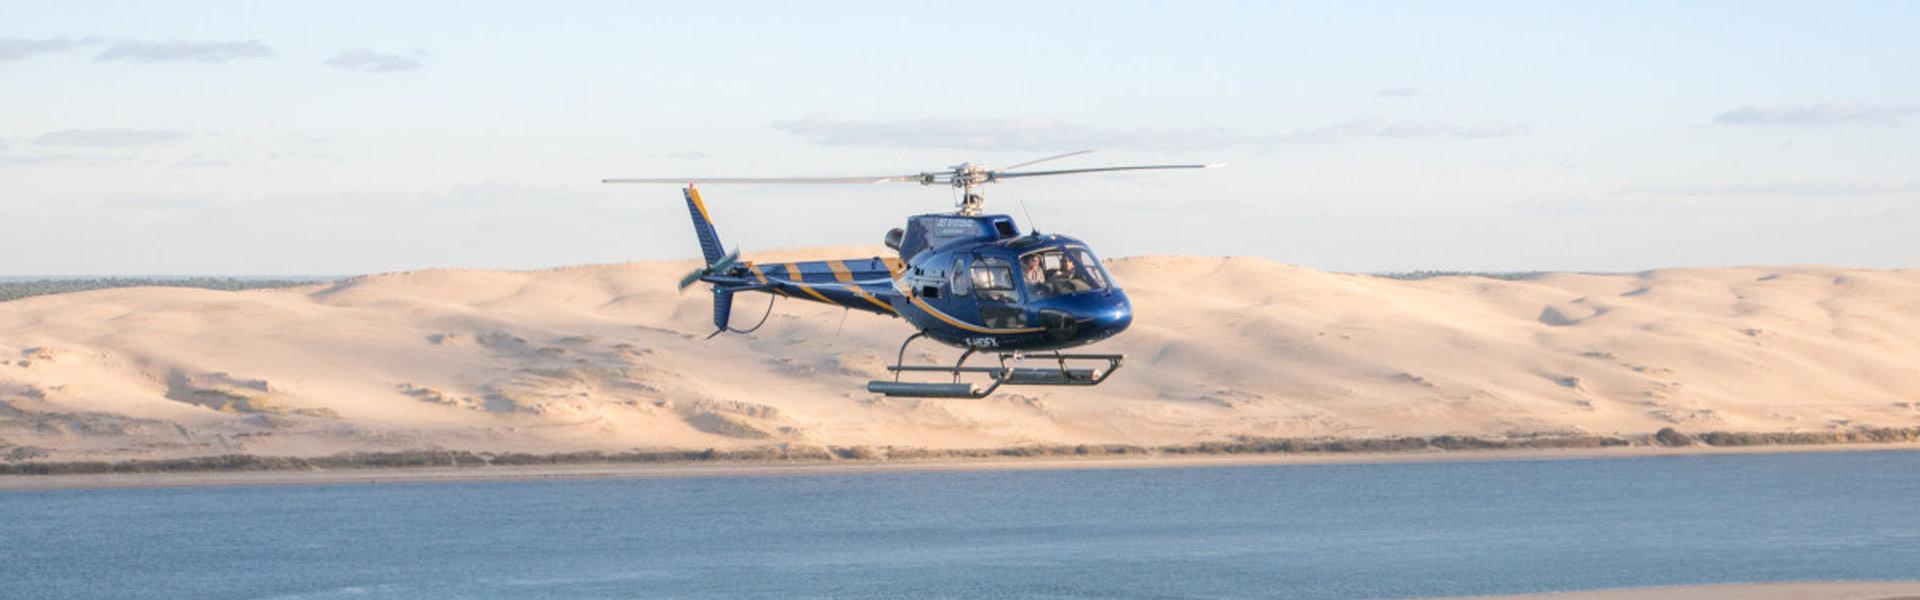 hélicoptère arcachon